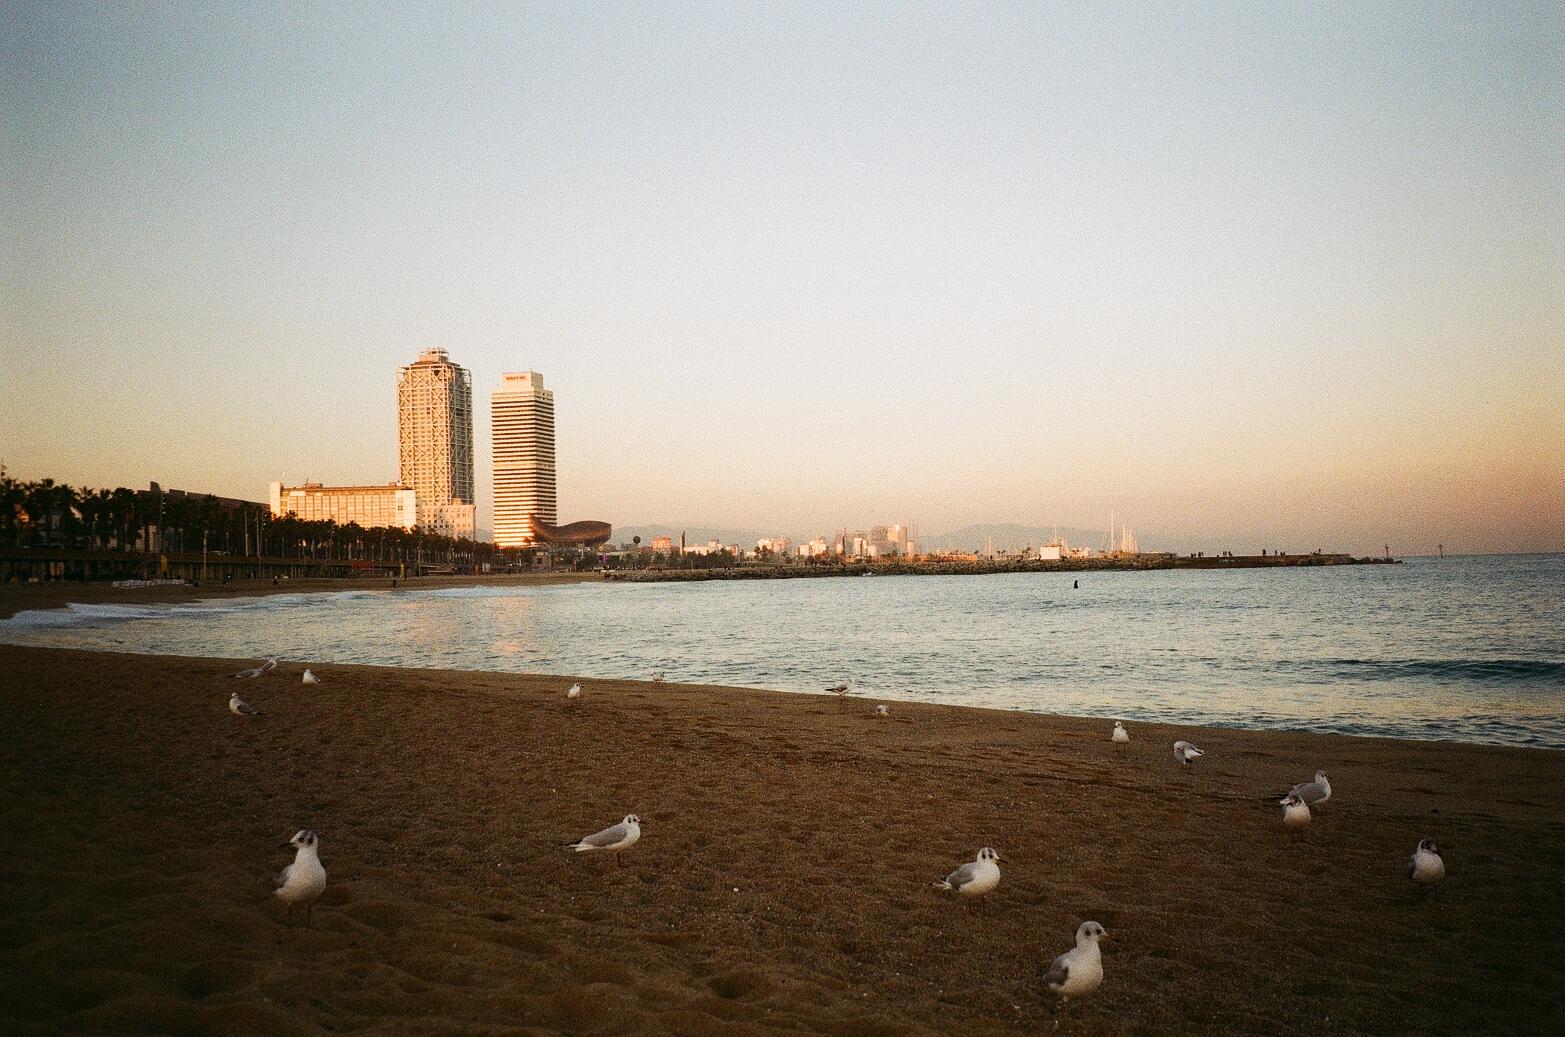 Barceloneta Beach captured on 35mm Film